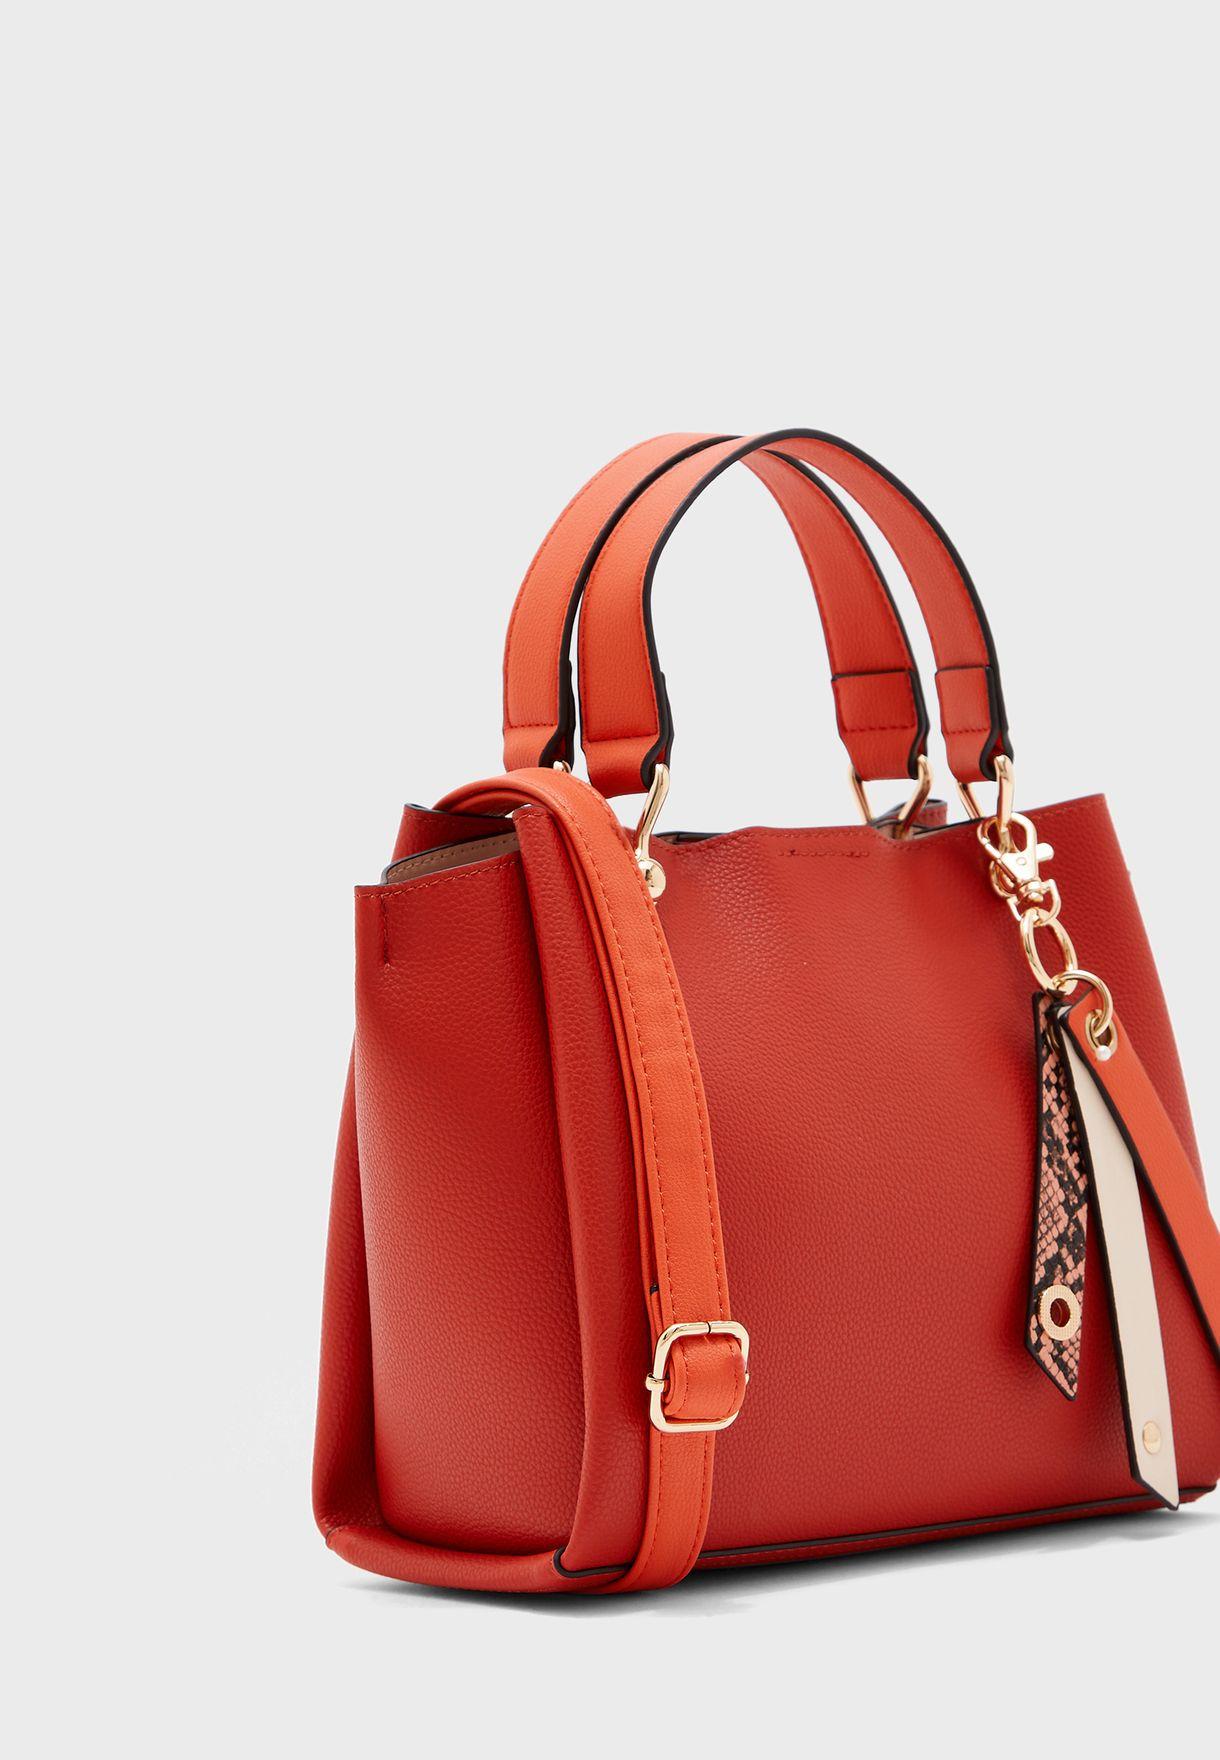 Aldo Viremma Tote - Brand bags